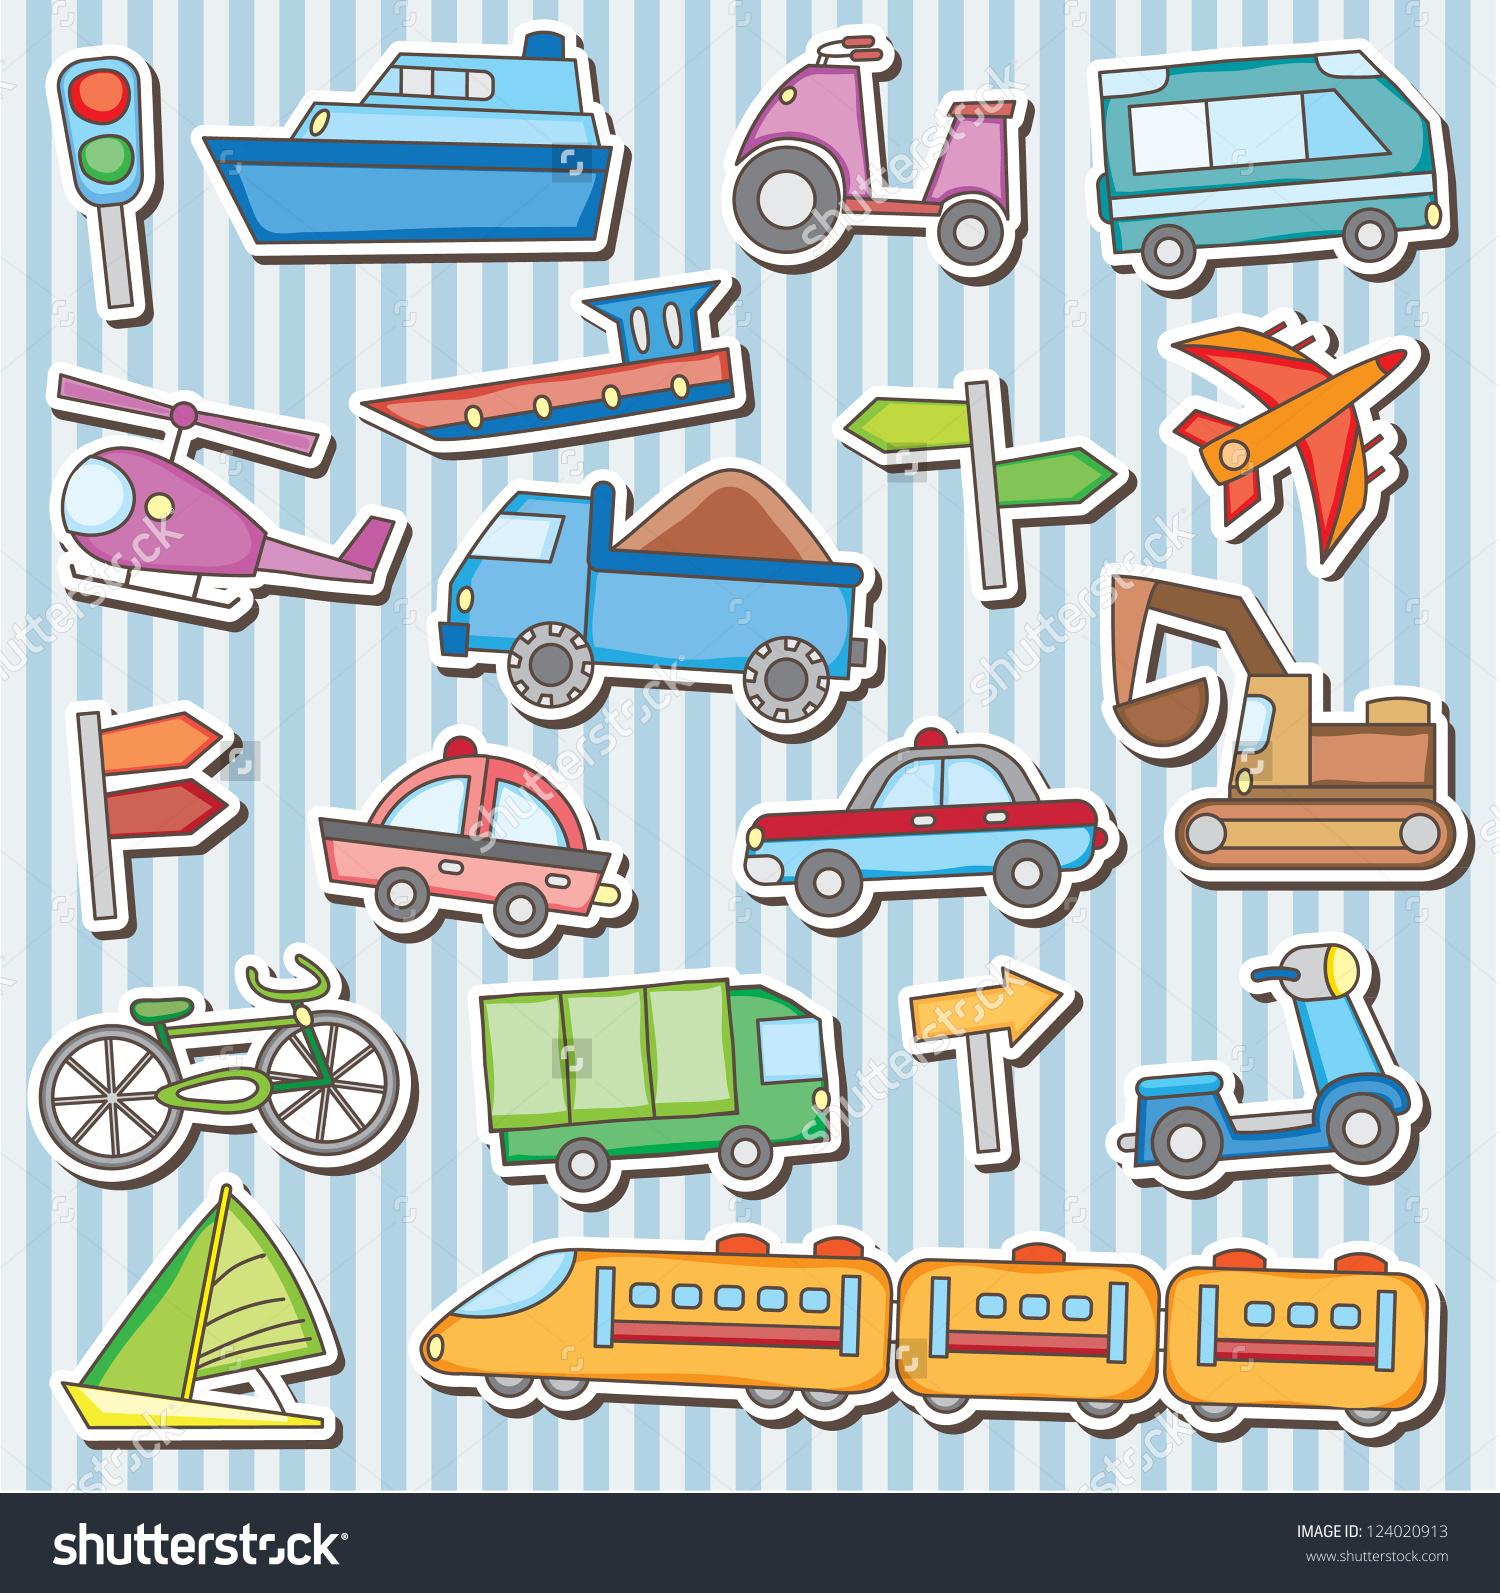 Cute Vehicles Clip Art Stock Vector 124020913.